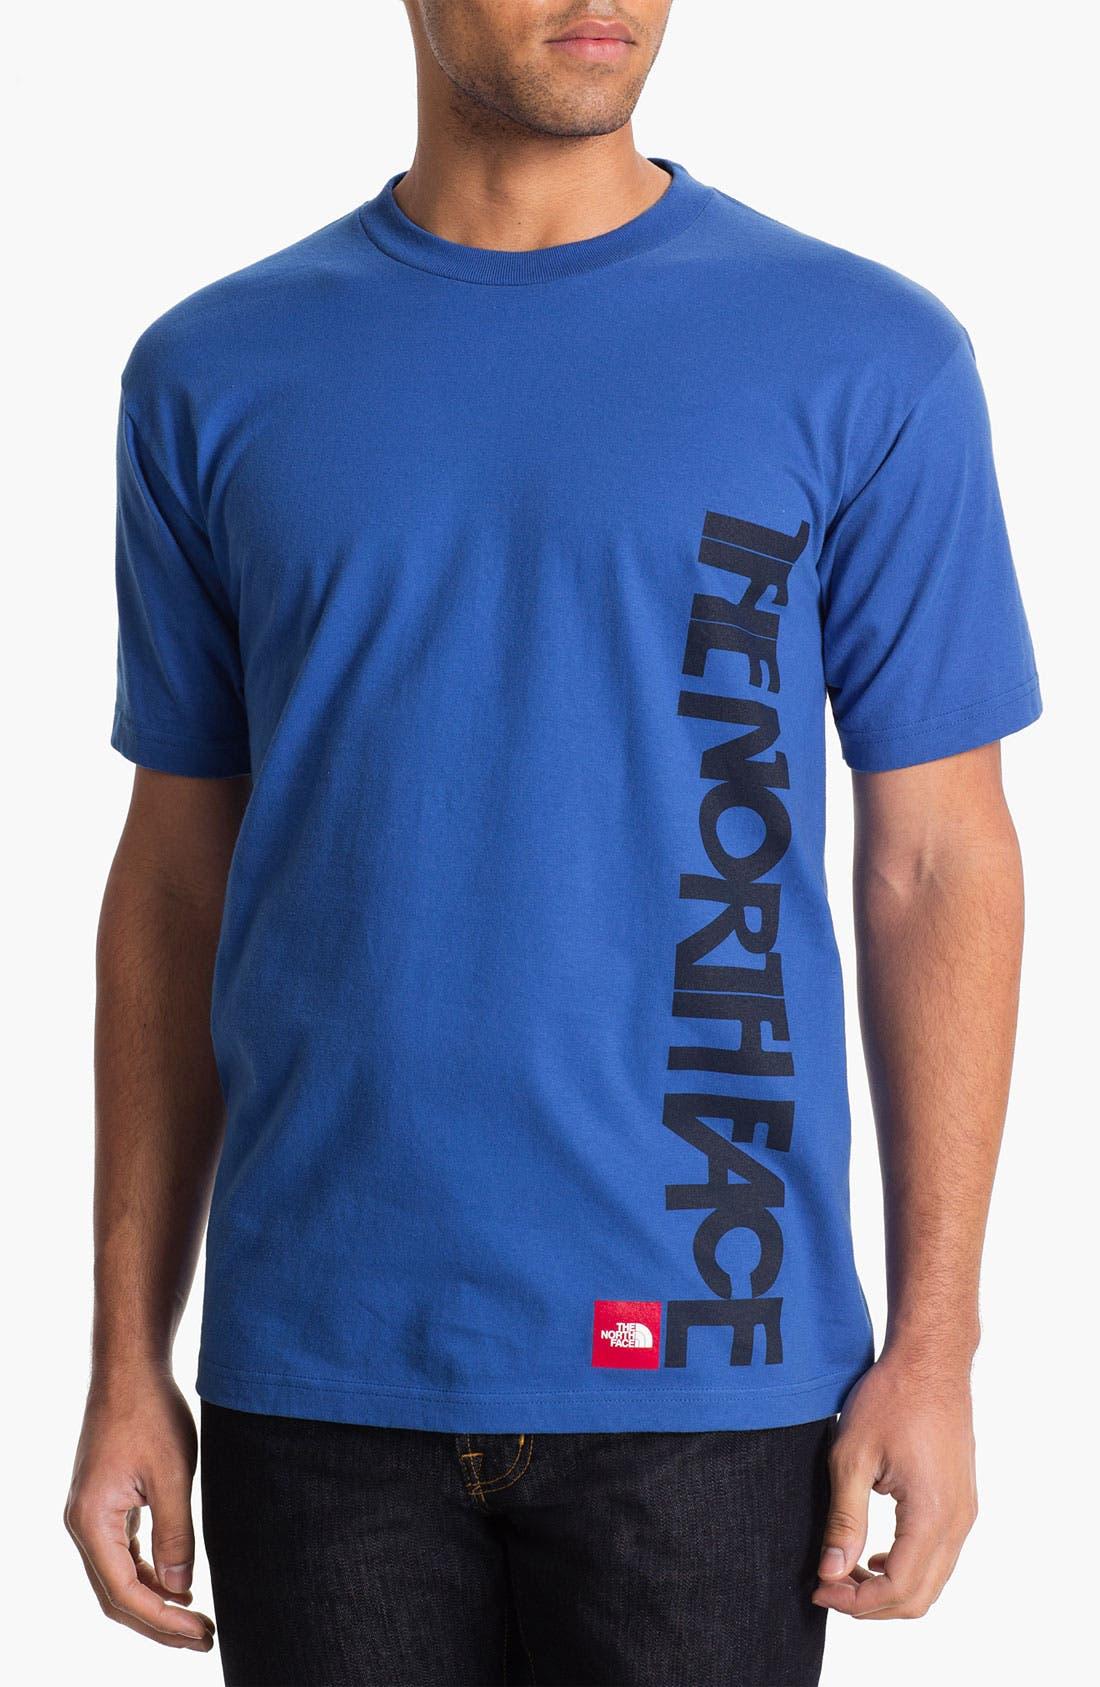 Main Image - The North Face 'Oseela' T-Shirt